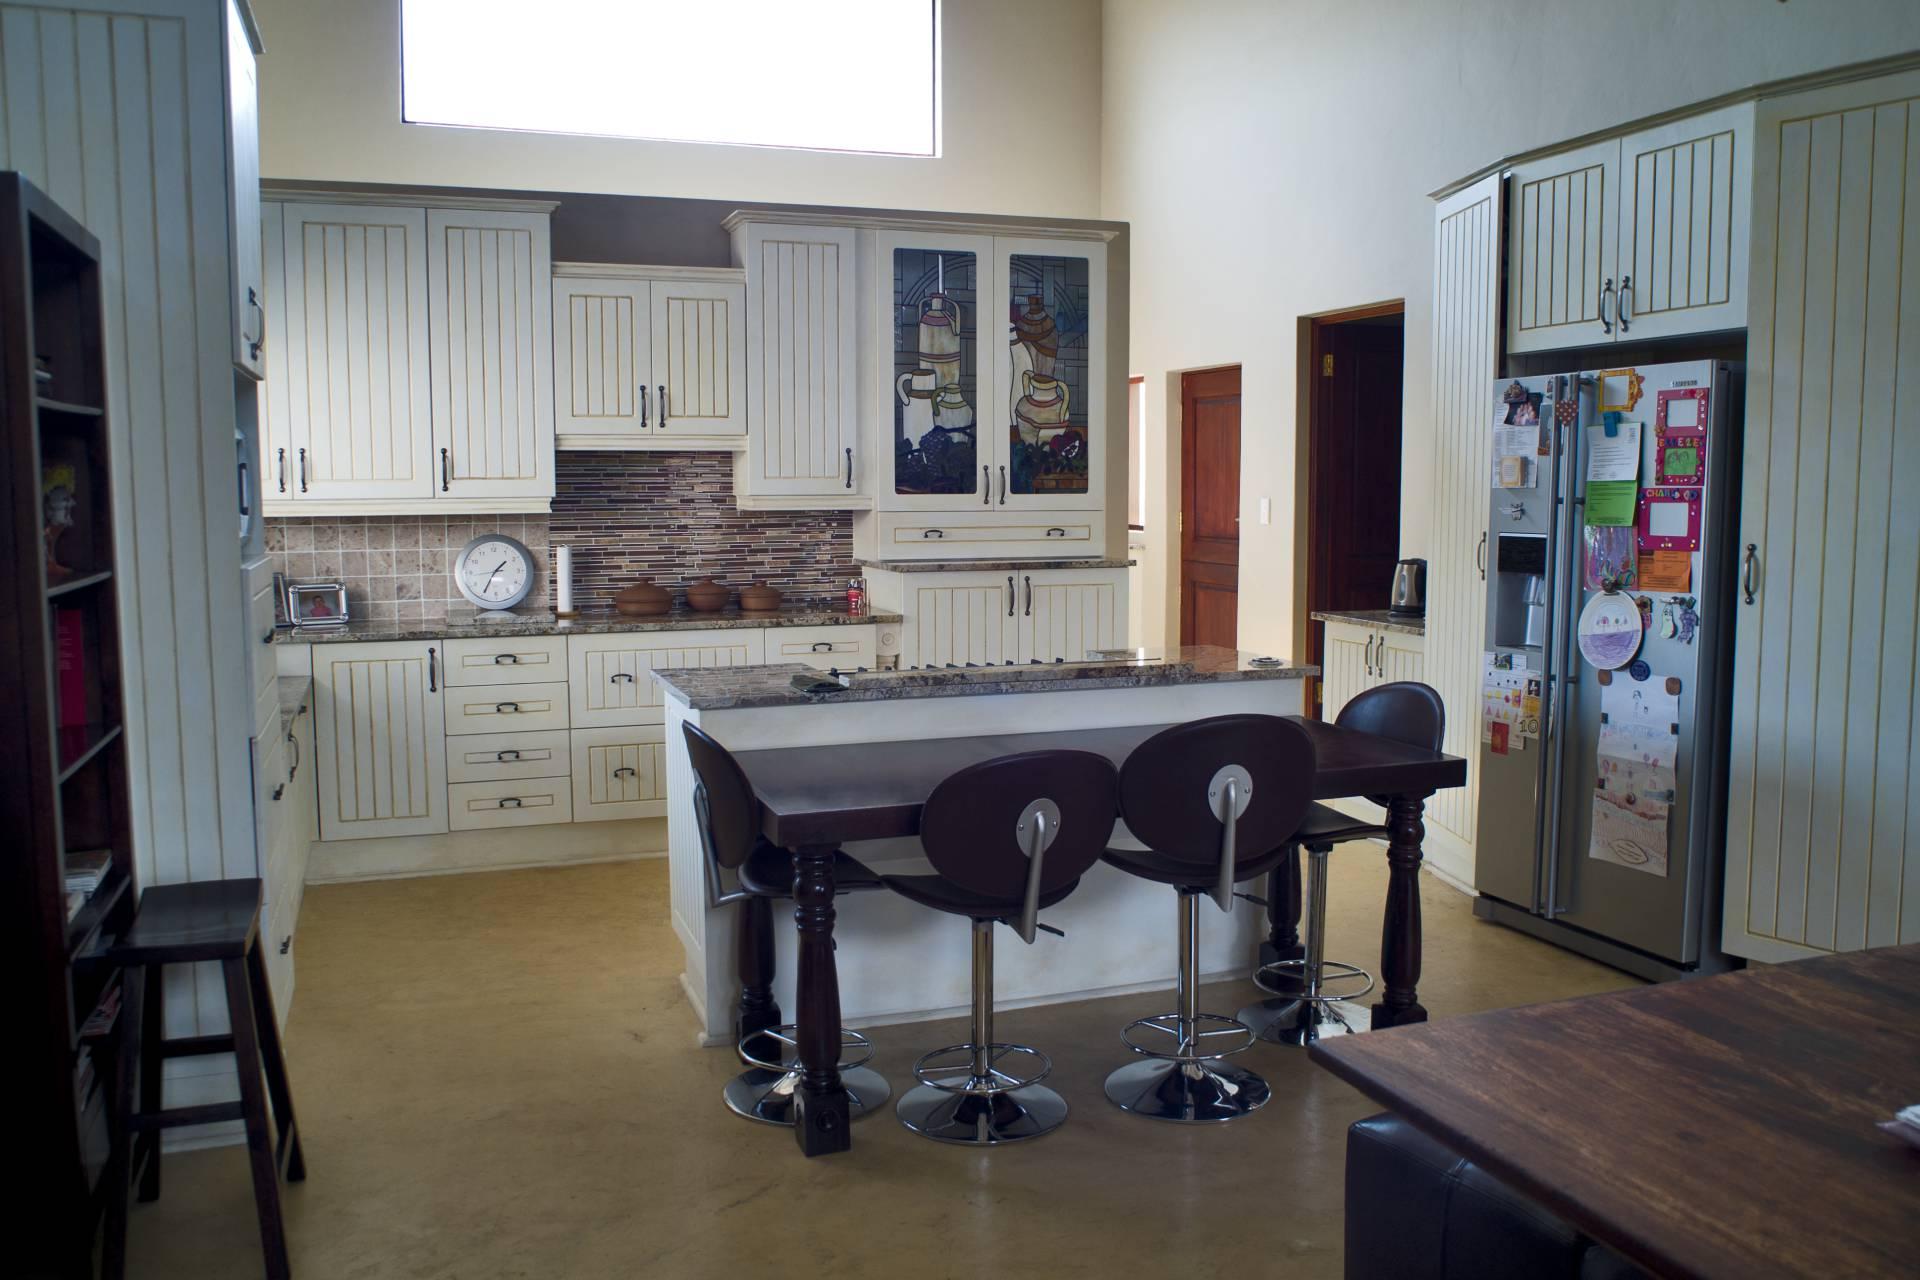 doorco kitchen designs and inspiration pretoria herchris creations kitchen cupboards pretoria cylex